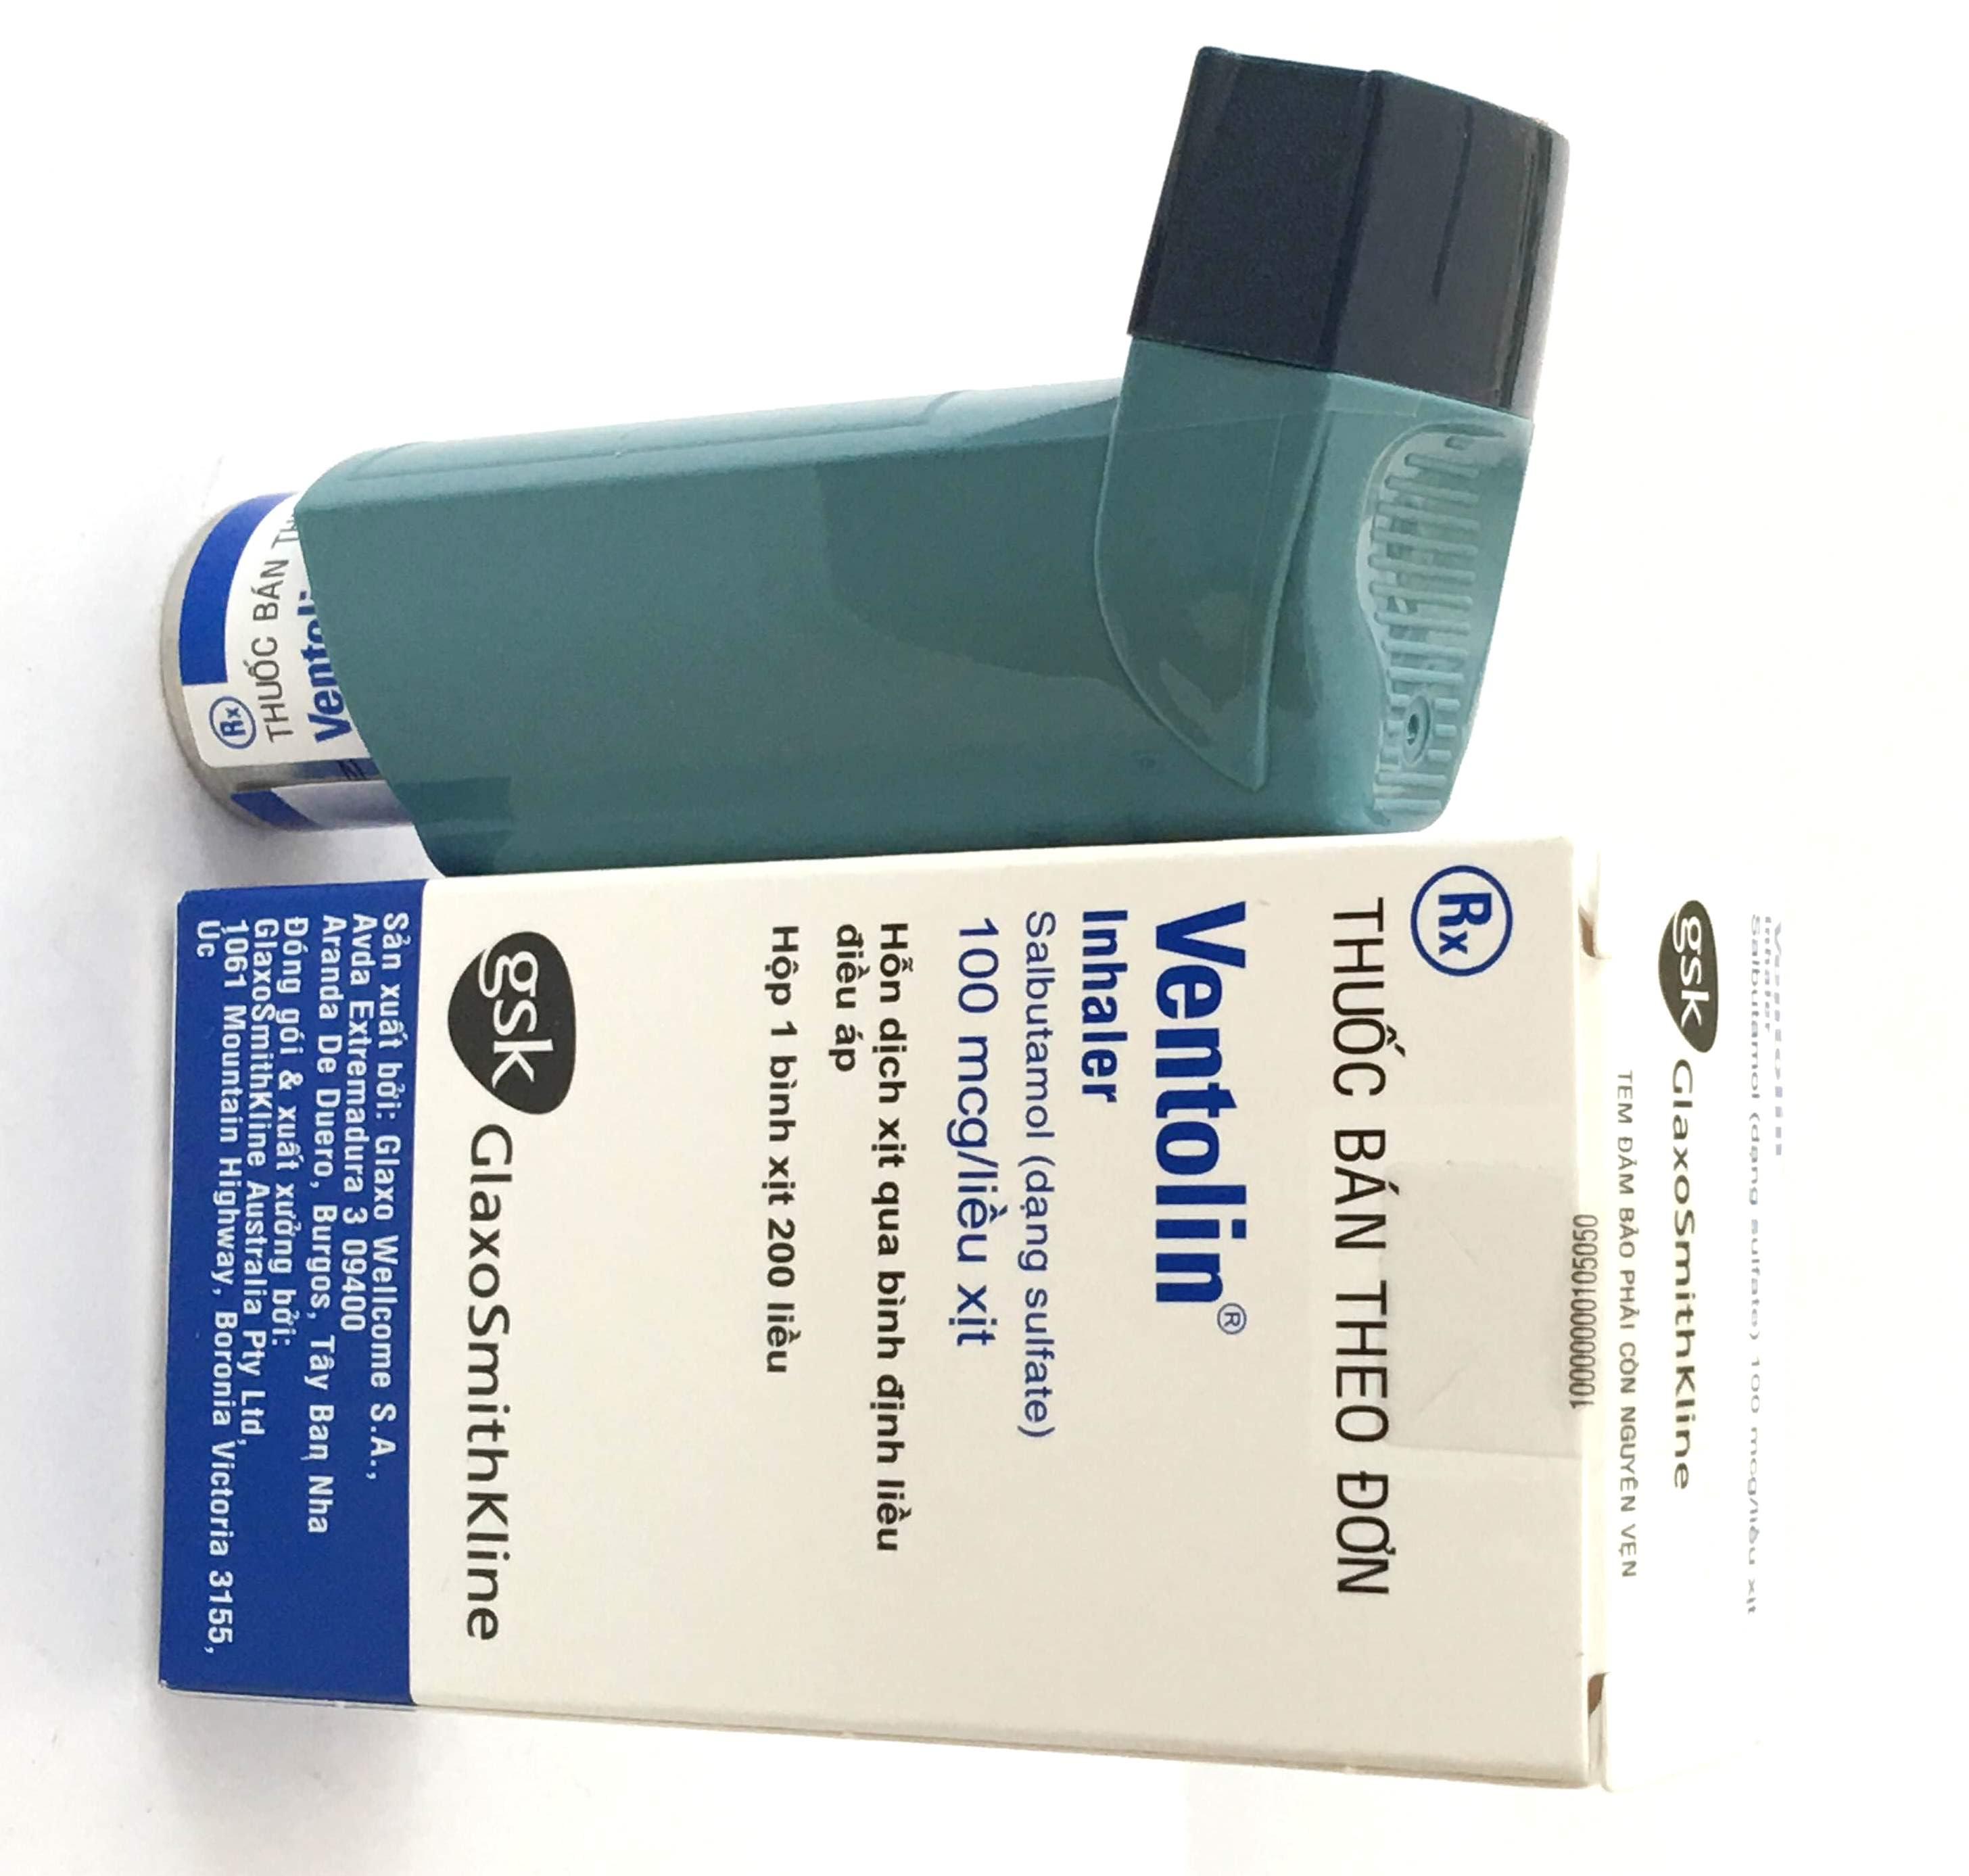 thuoc-gian-phe-quan-salbutamol-co-tot-khong